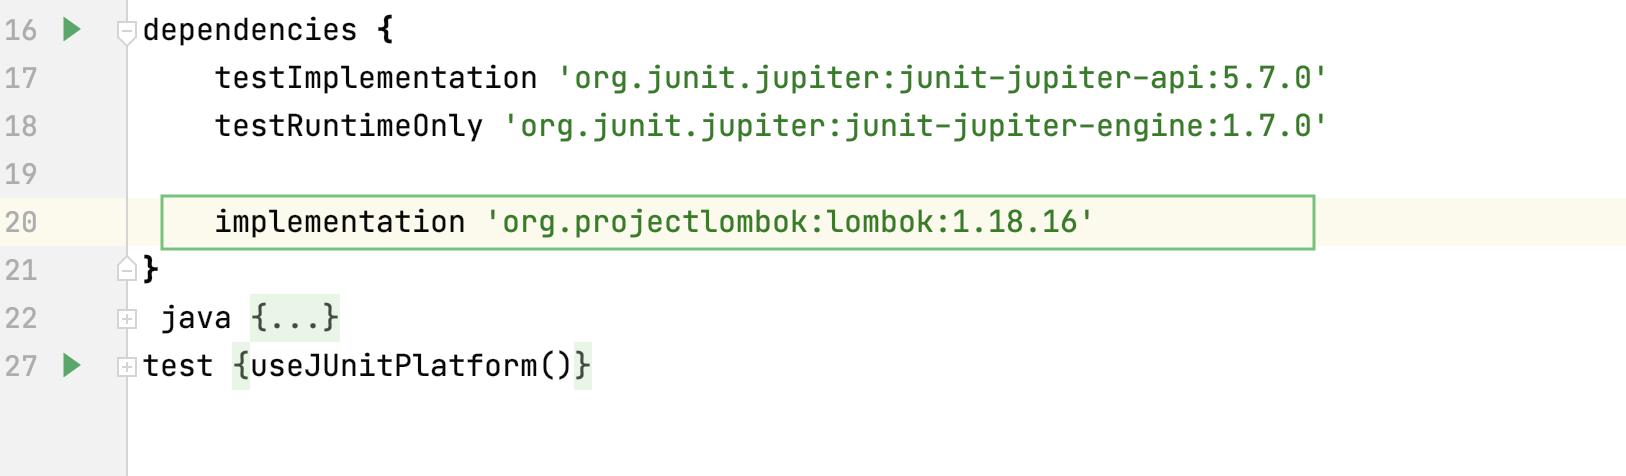 Build script: added dependency